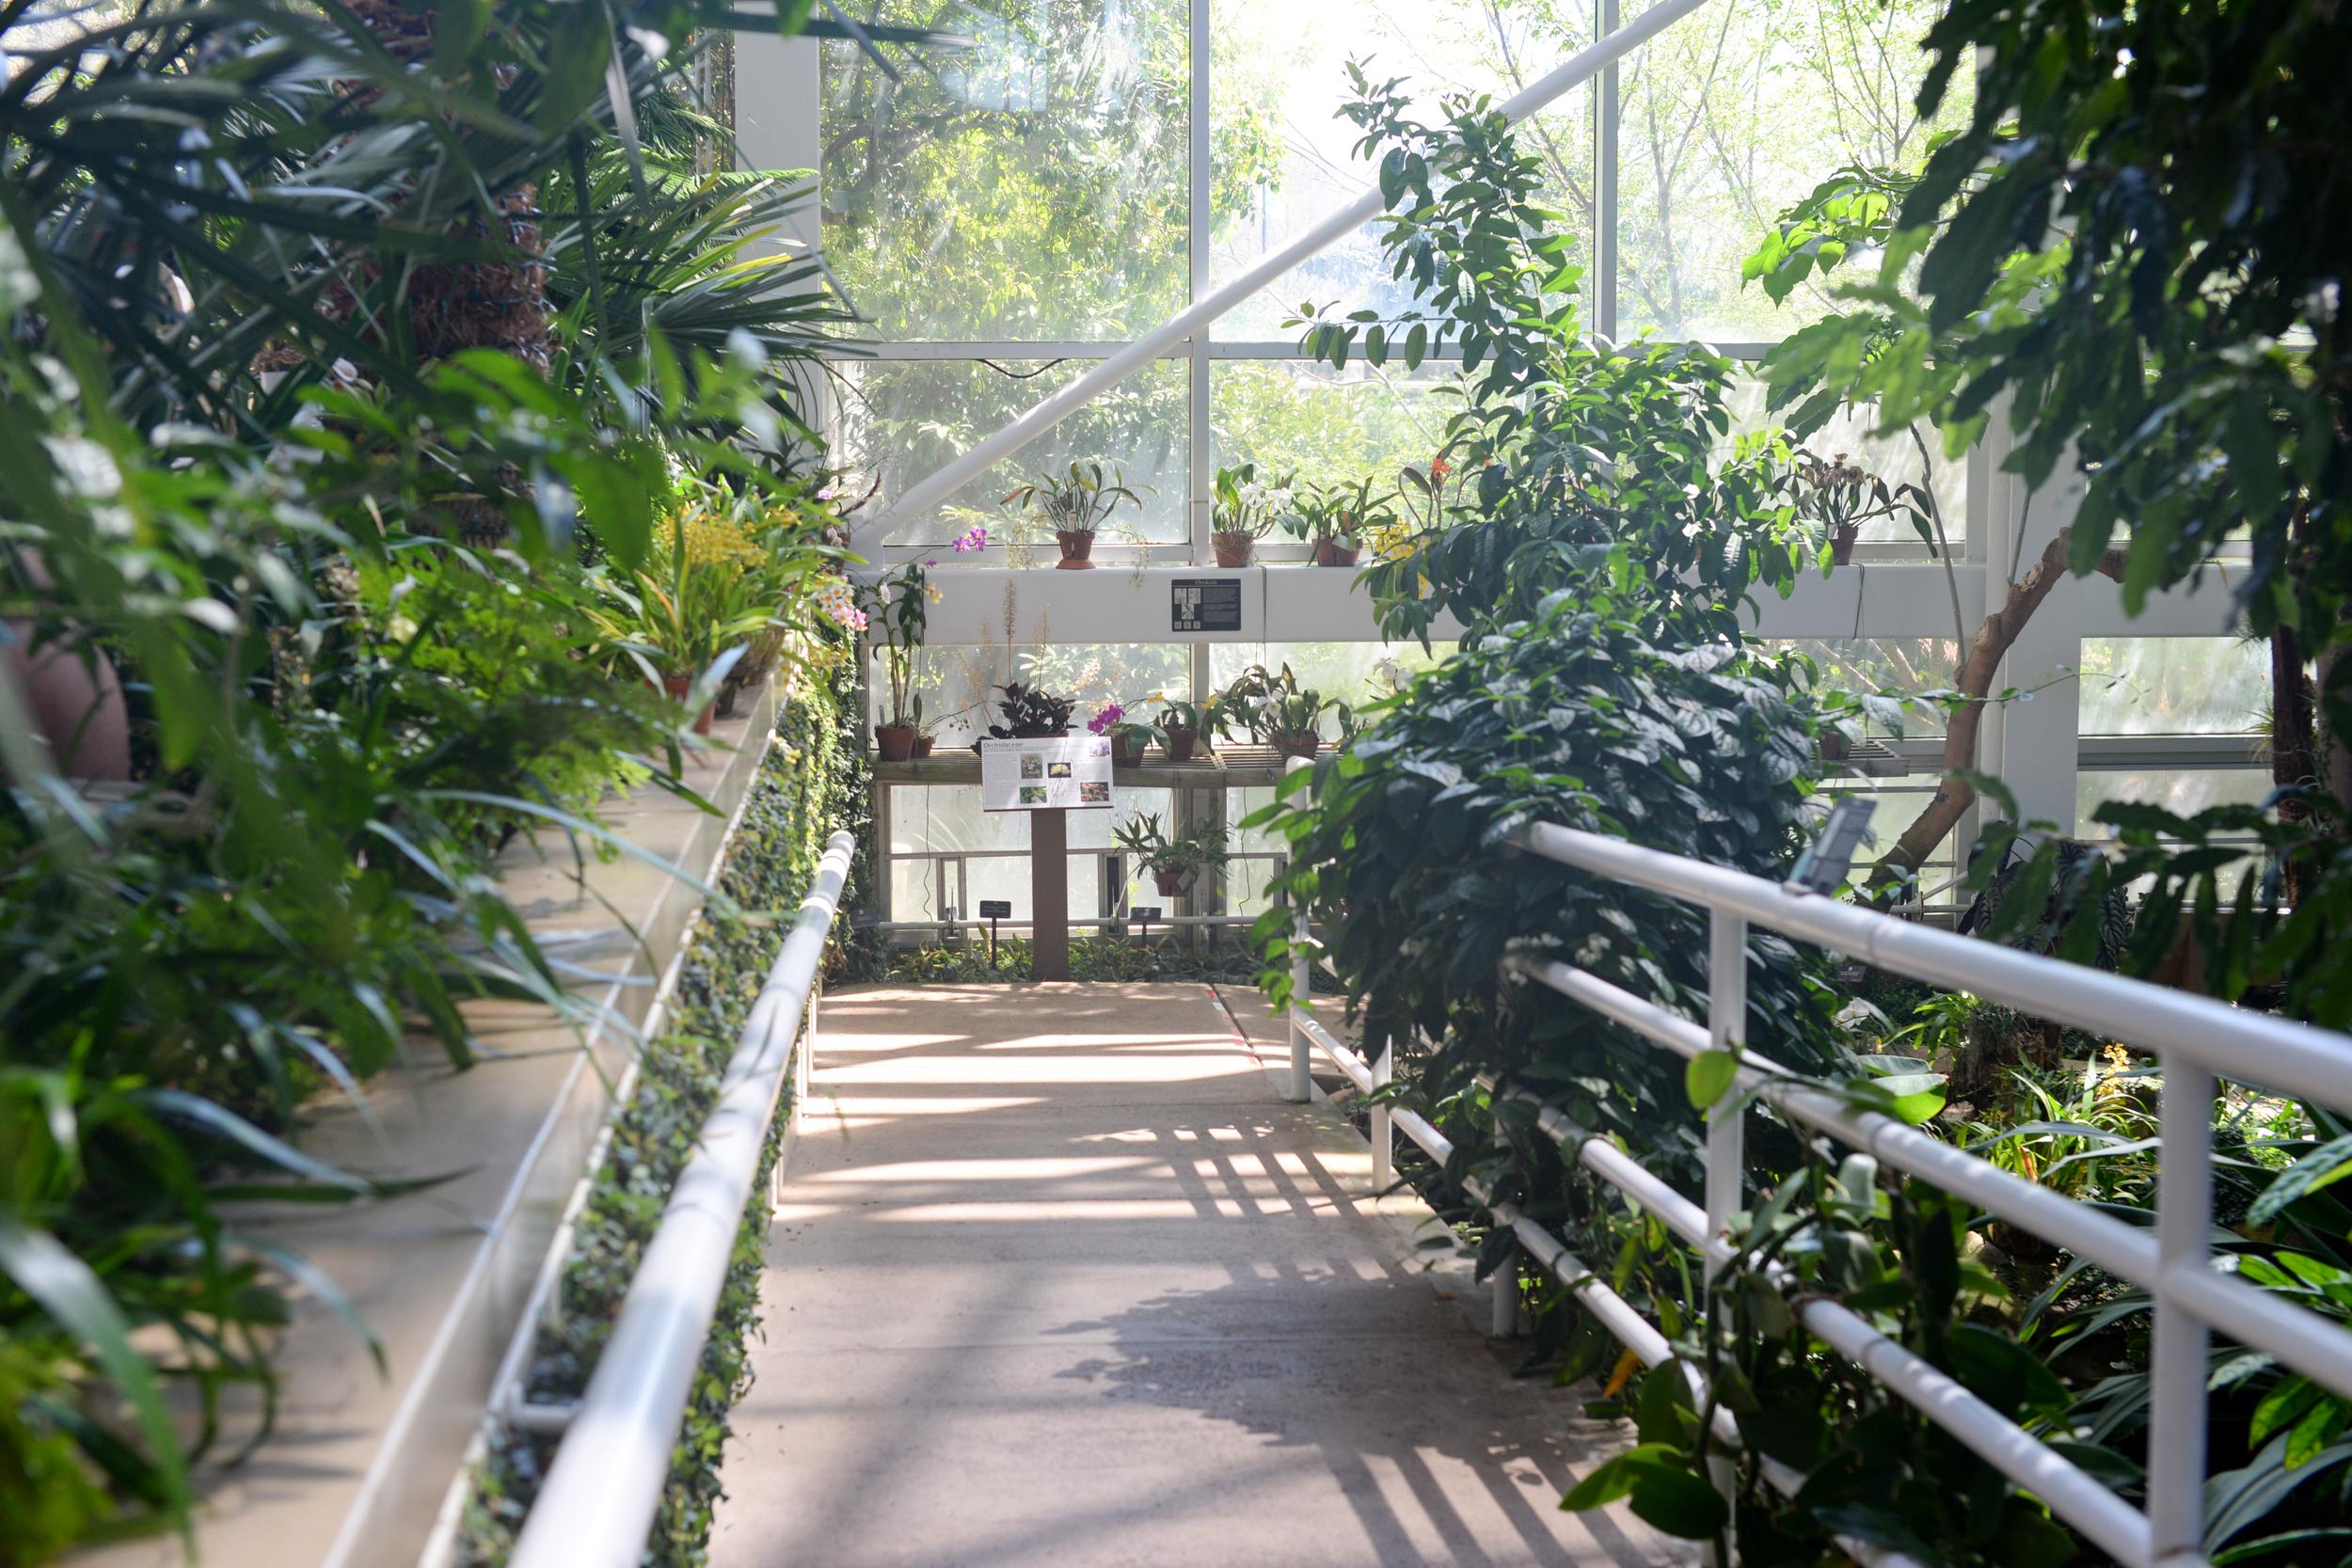 150404_hkp_botanicalgardens001.jpg